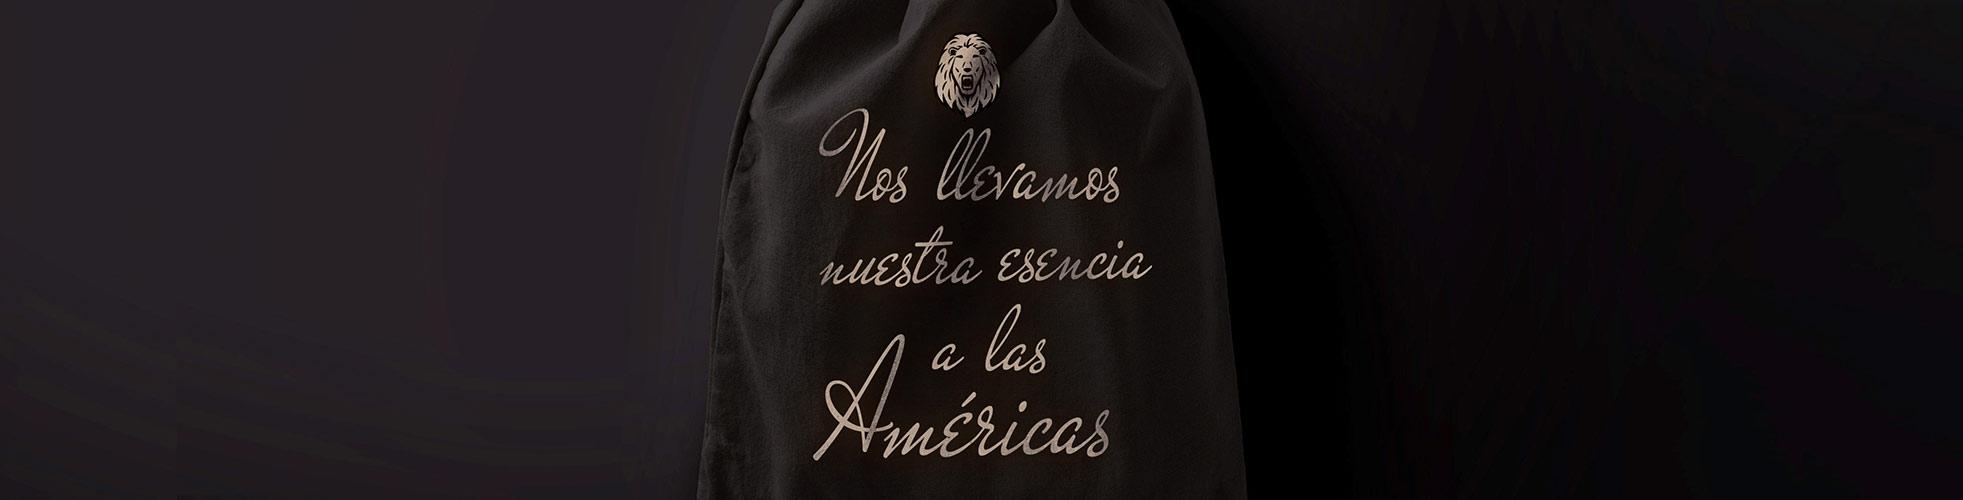 "CR Class se va a hacer las «Américas"""